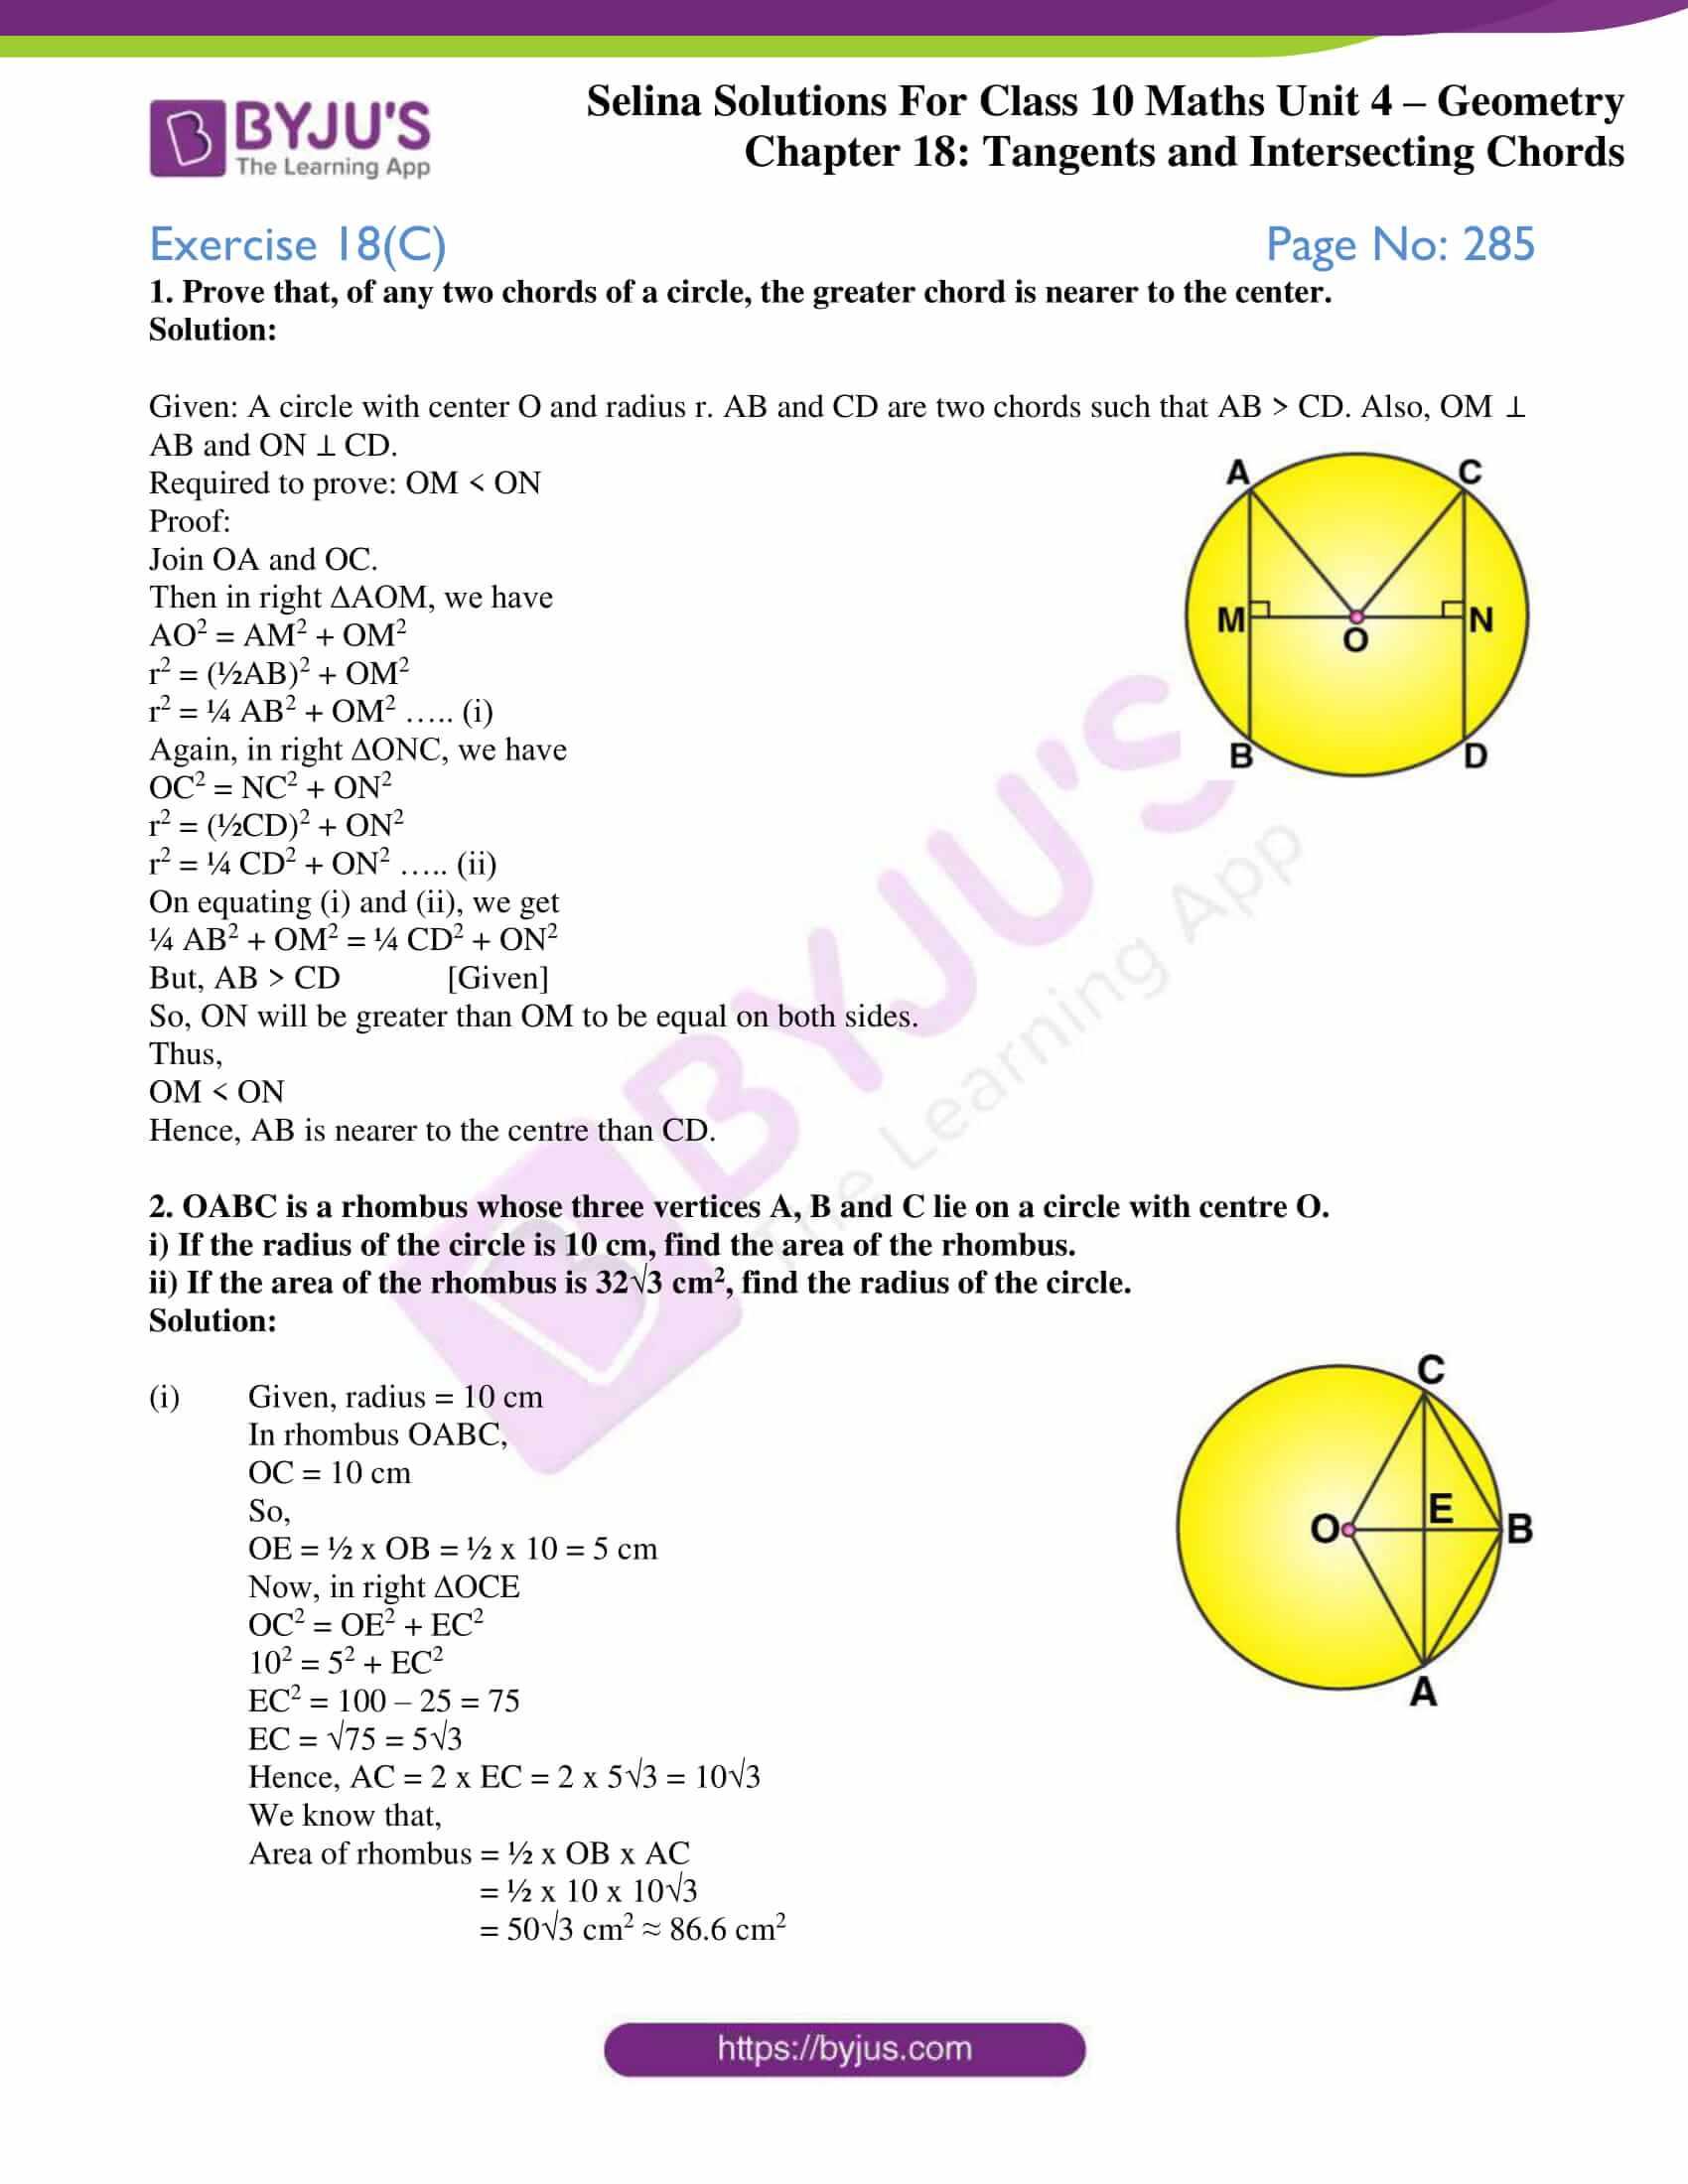 selina-sol-maths-class-10-ch-18-ex-c-01